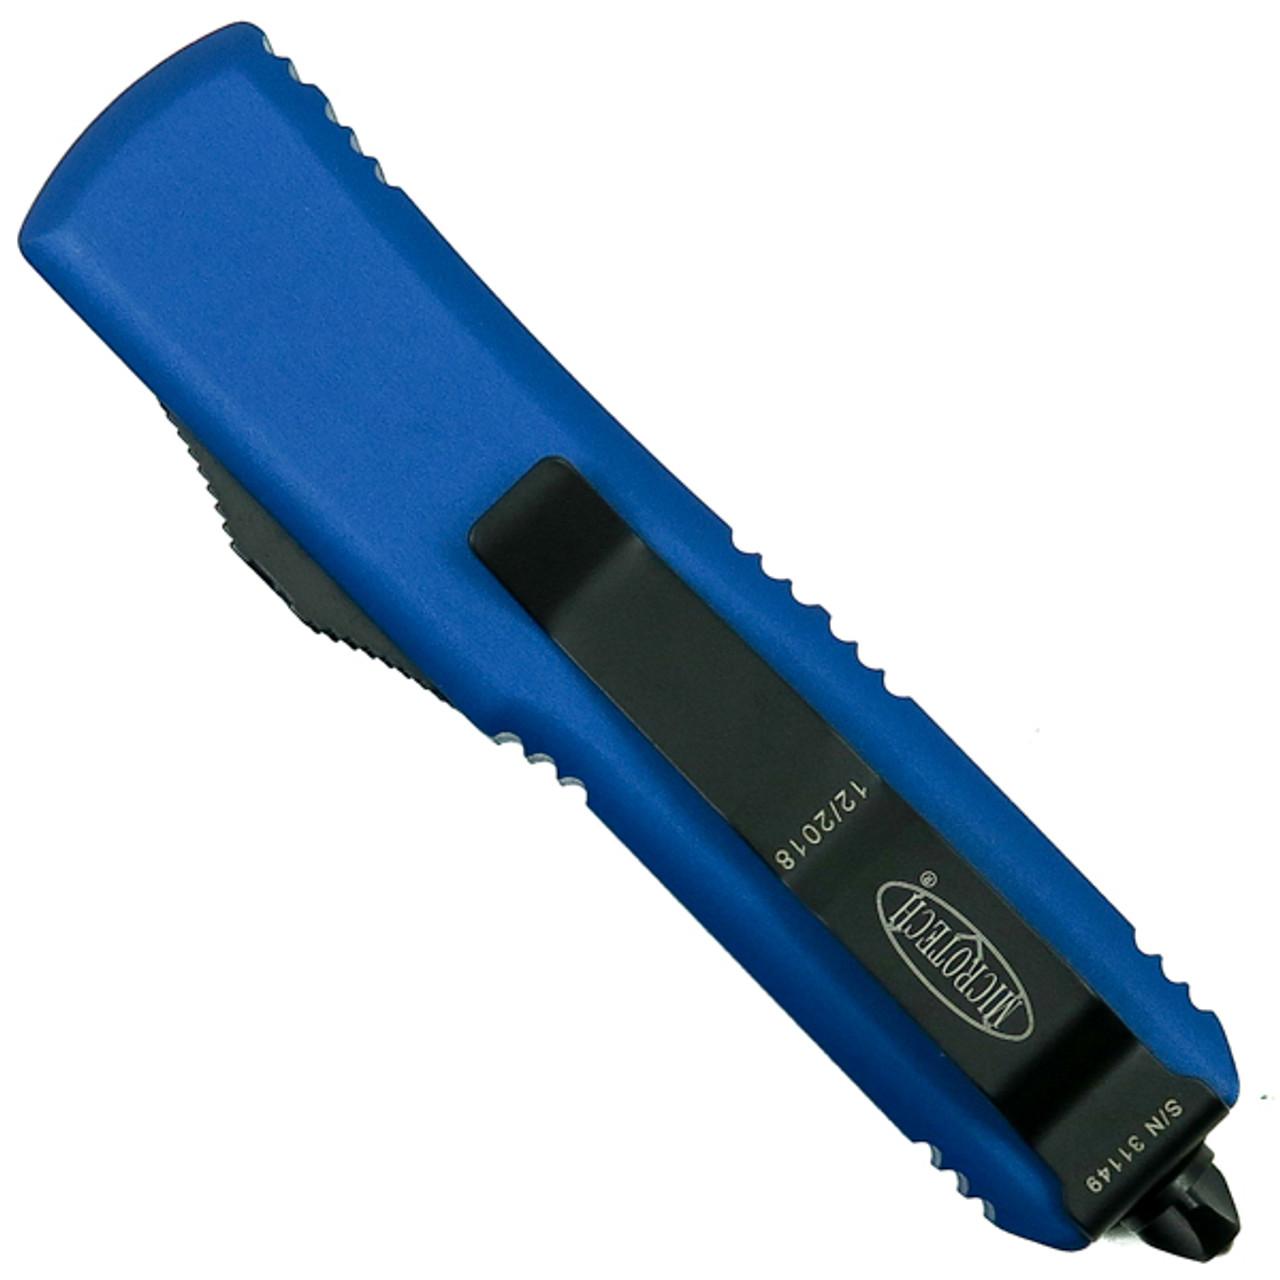 Microtech Blue UTX-85 Dagger OTF Auto Knife, Black Blade REAR VIEW